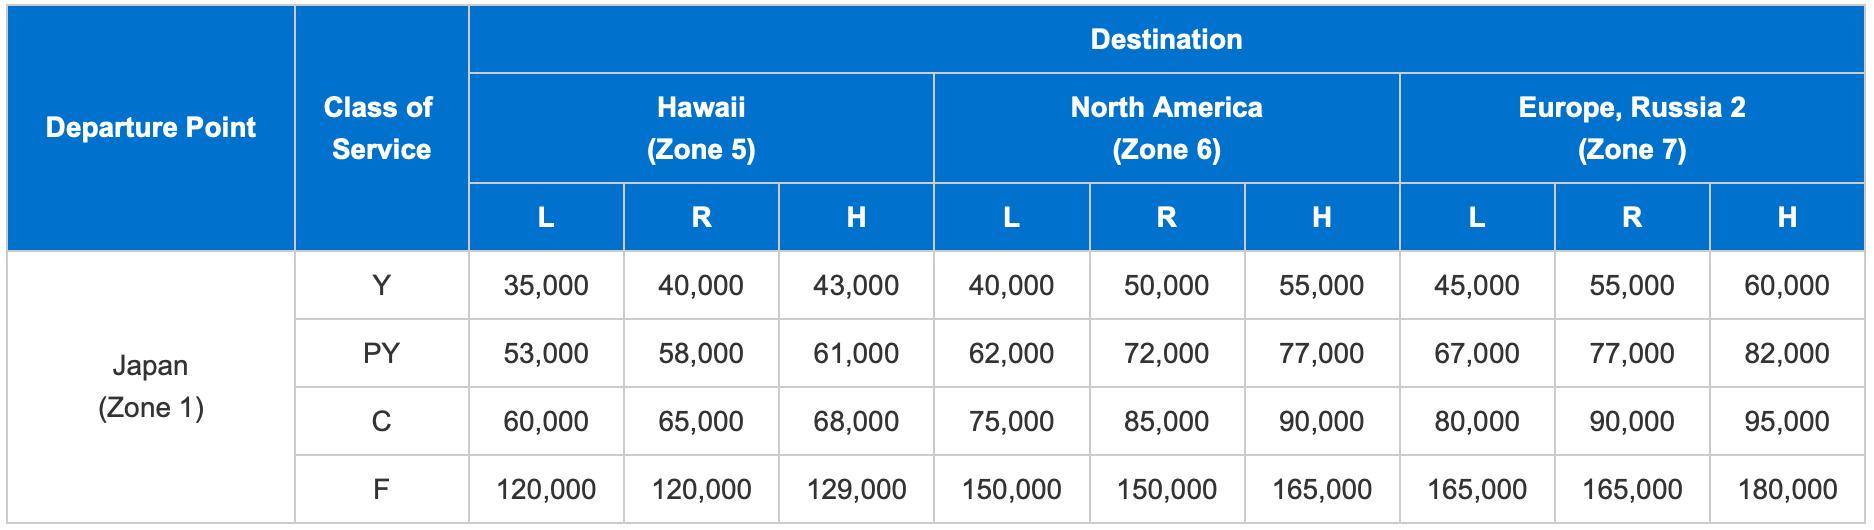 ANA-Award-Chart-North-America-to-Japan